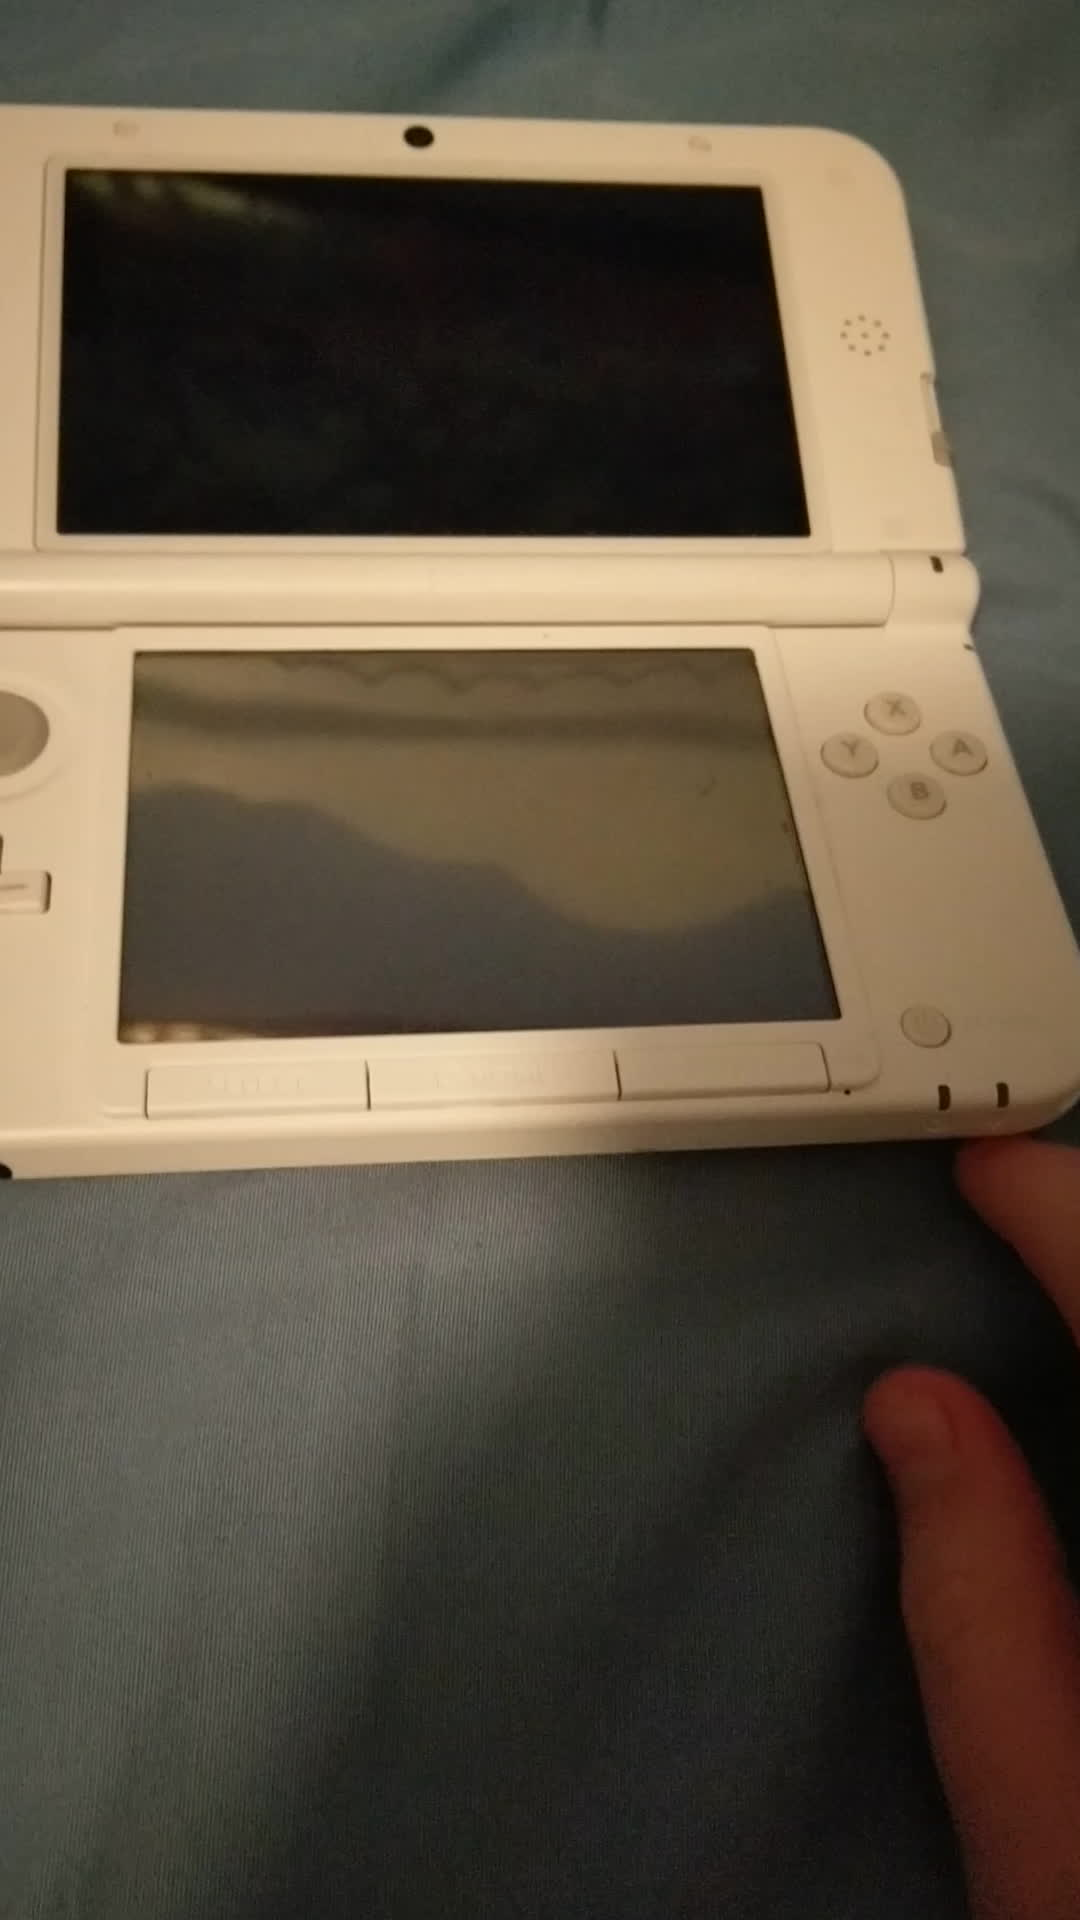 3DS, Broken 3ds help GIFs